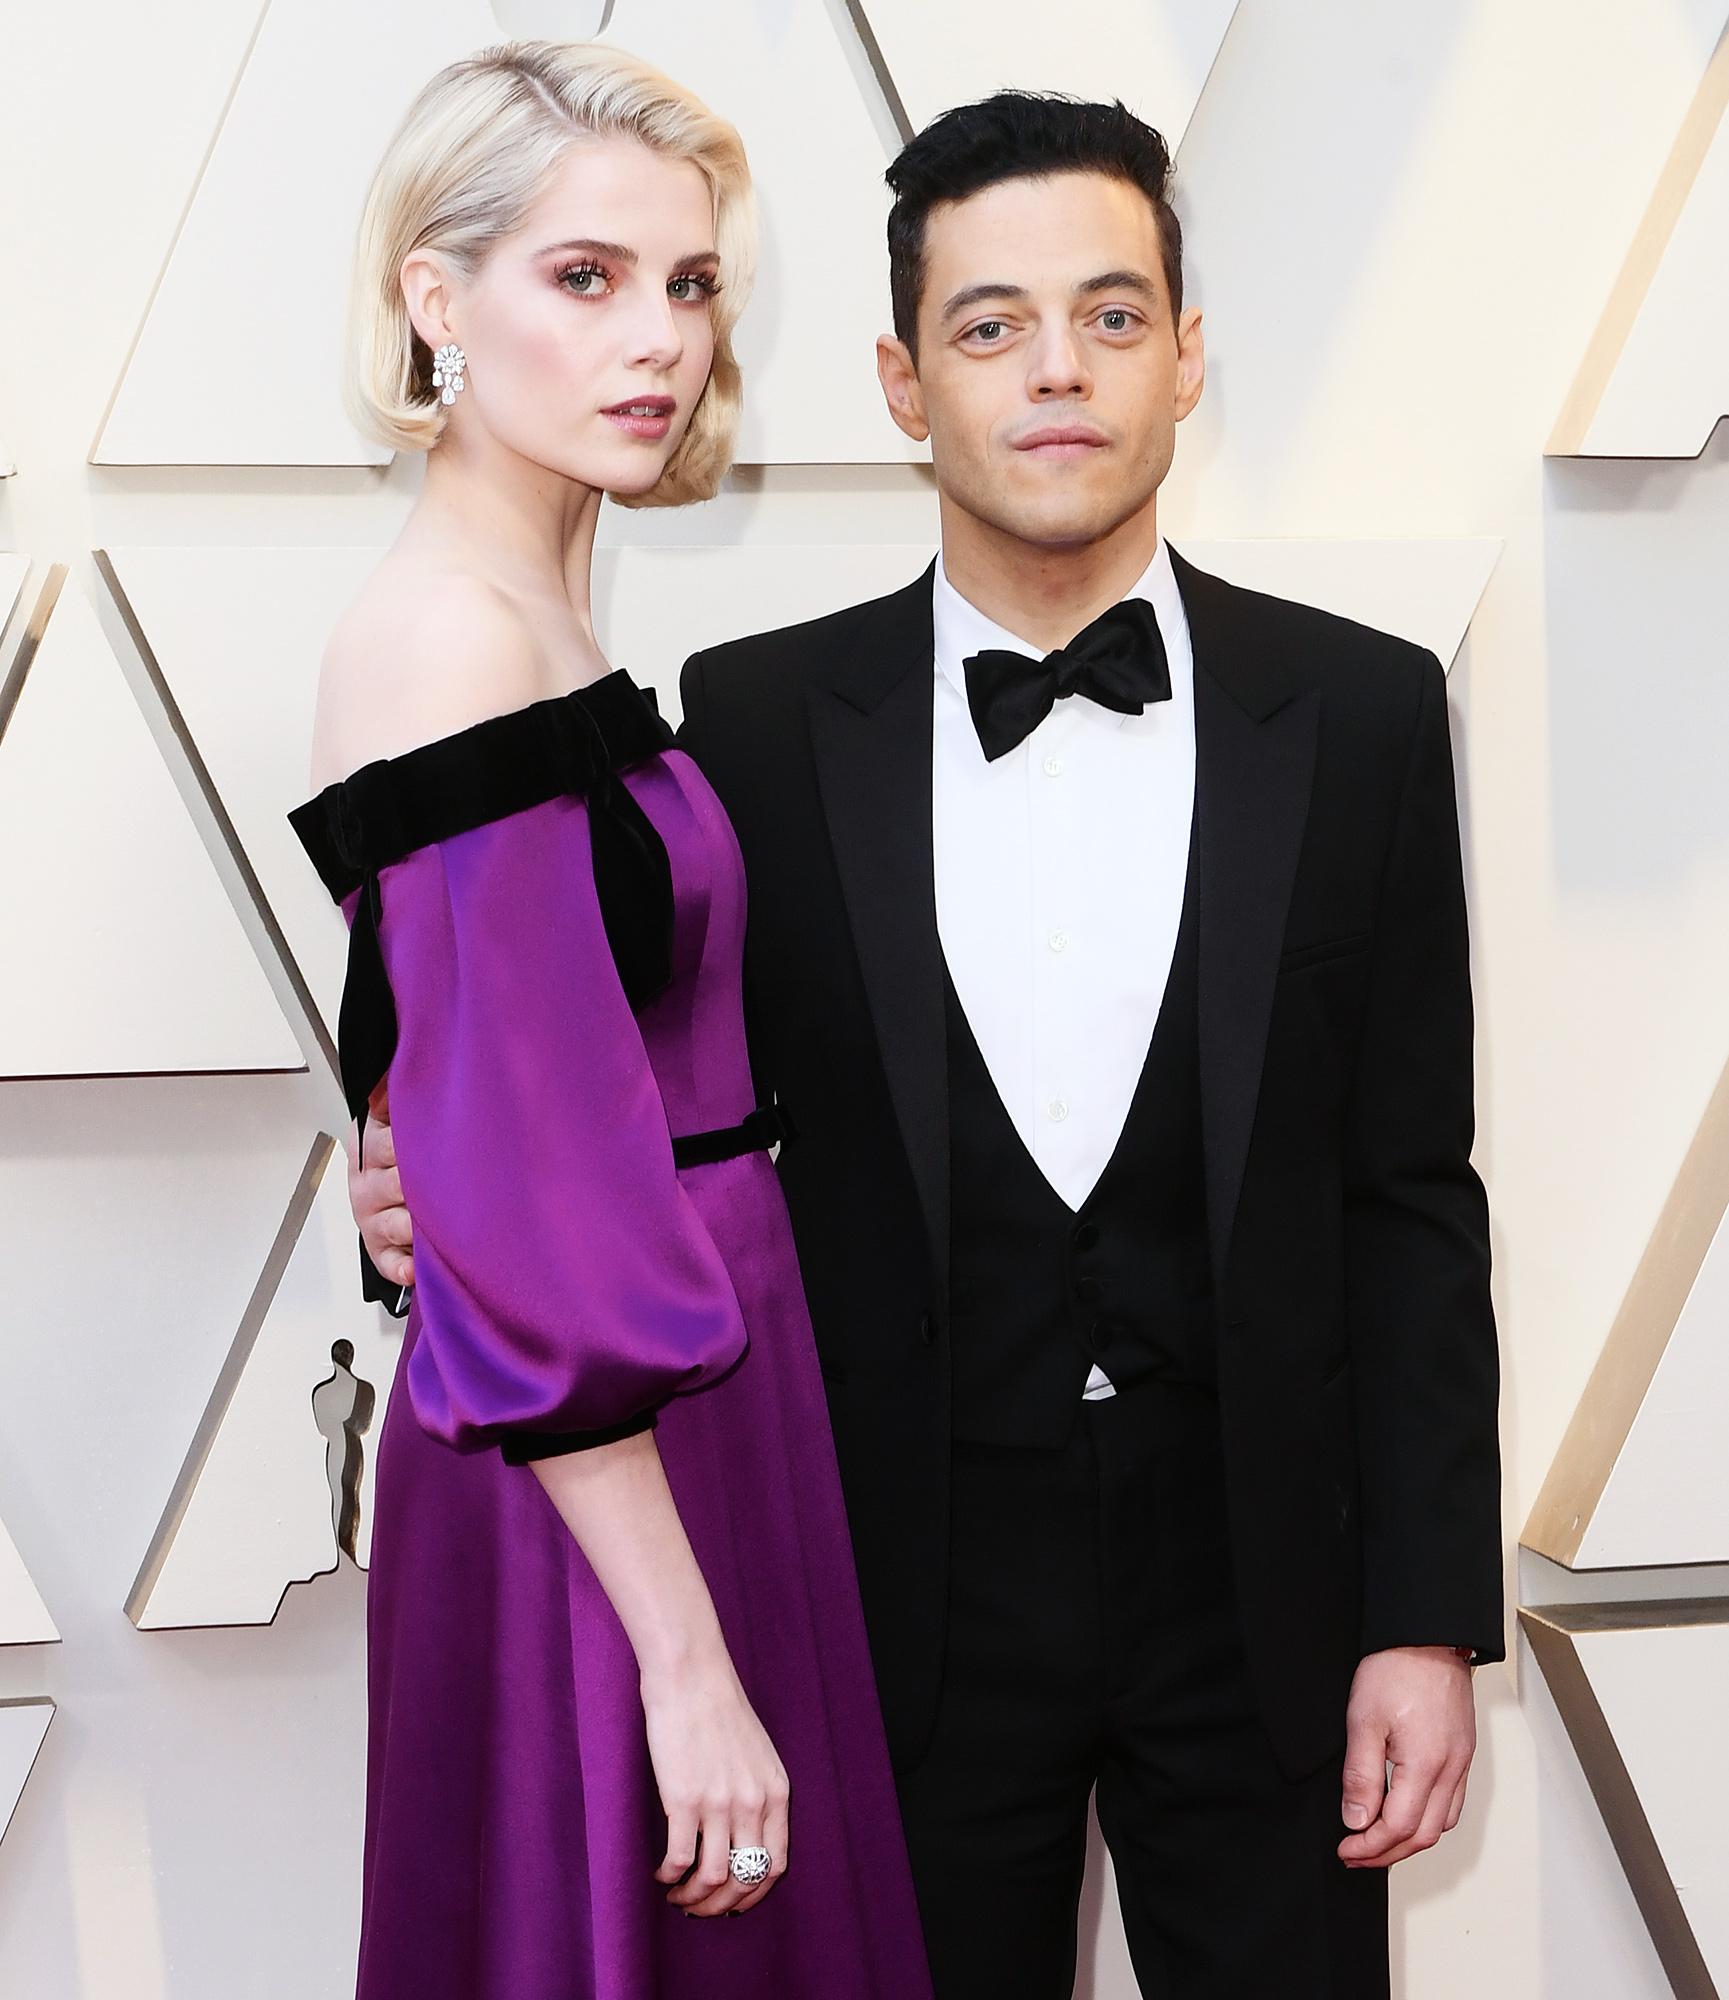 Lucy Boynton and Rami Malek at Oscars 2019